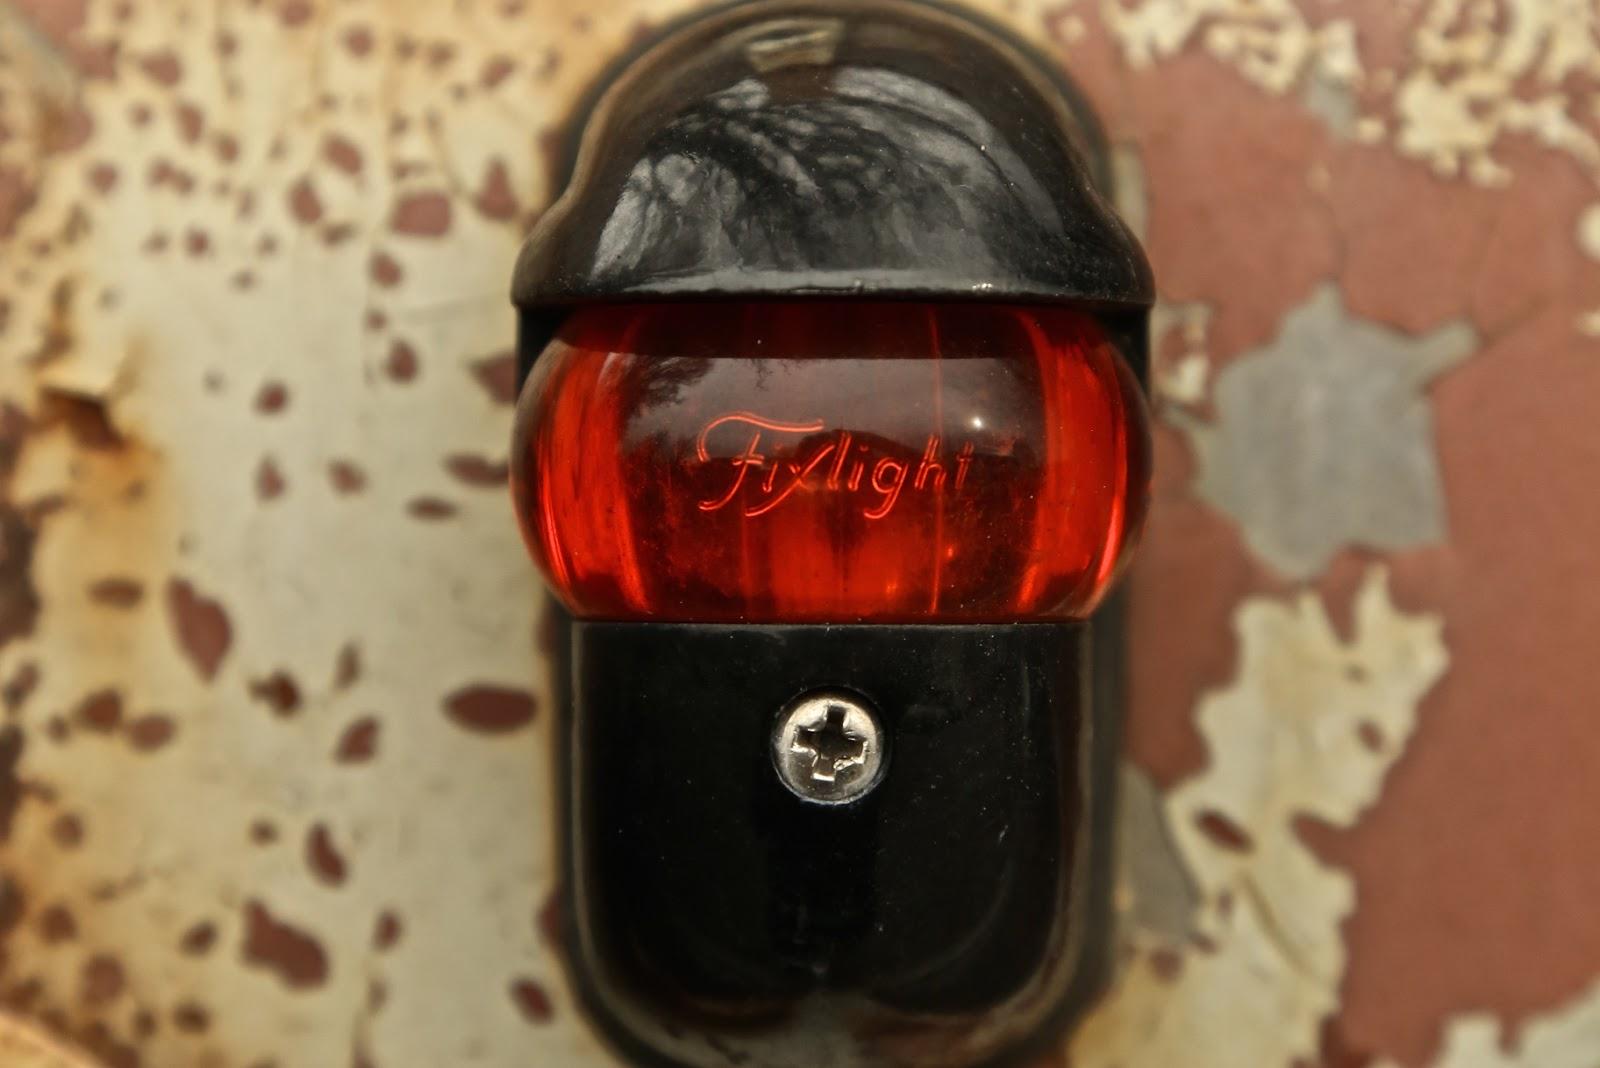 Fixlight